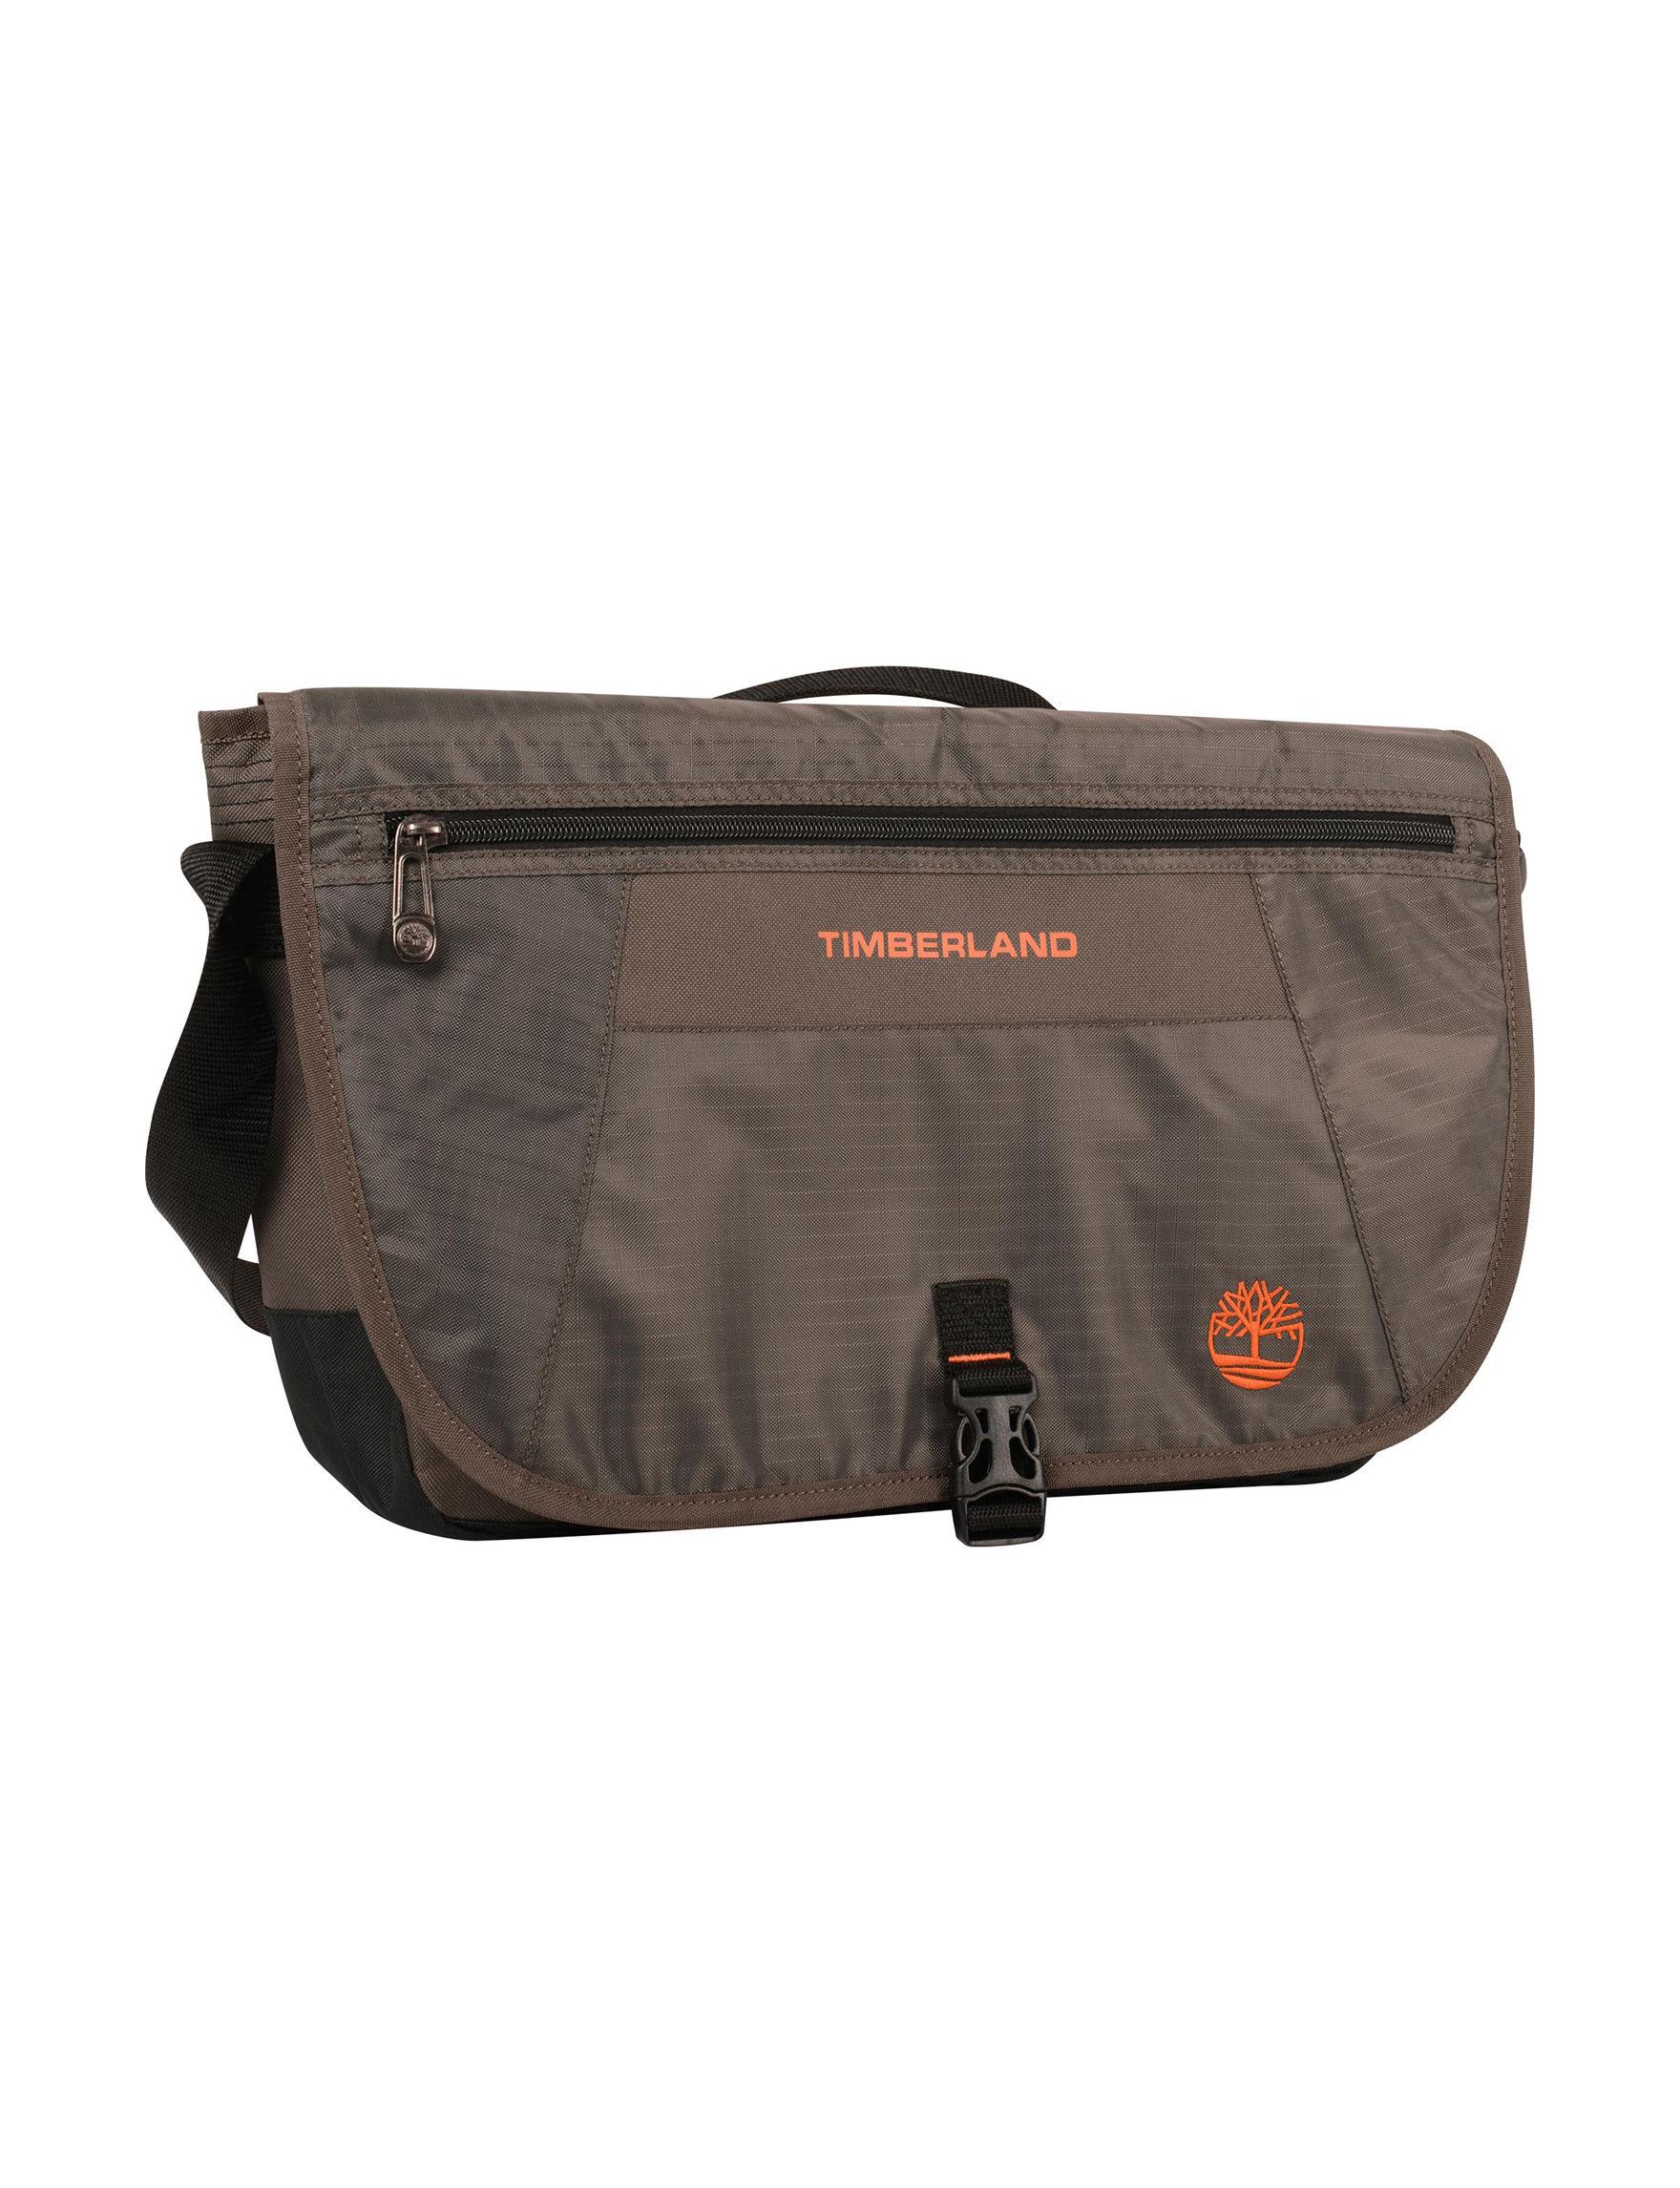 Timberland Brown Laptop & Messenger Bags